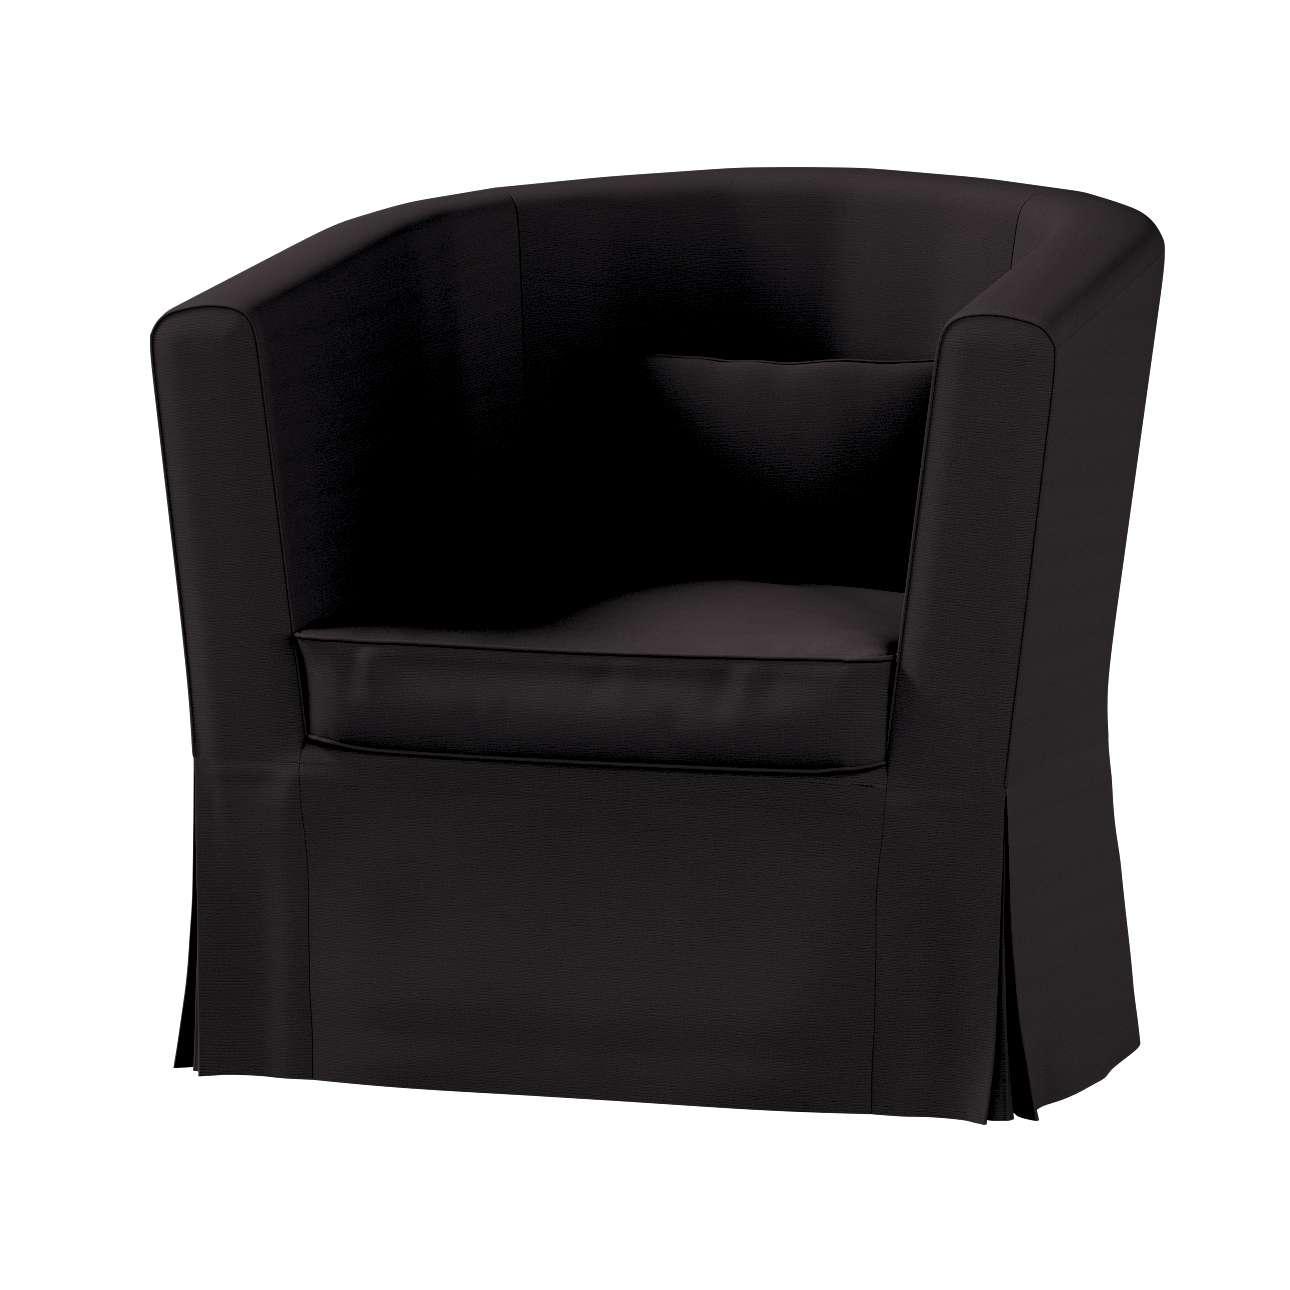 Pokrowiec na fotel Ektorp Tullsta fotel Ektorp Tullsta w kolekcji Cotton Panama, tkanina: 702-08